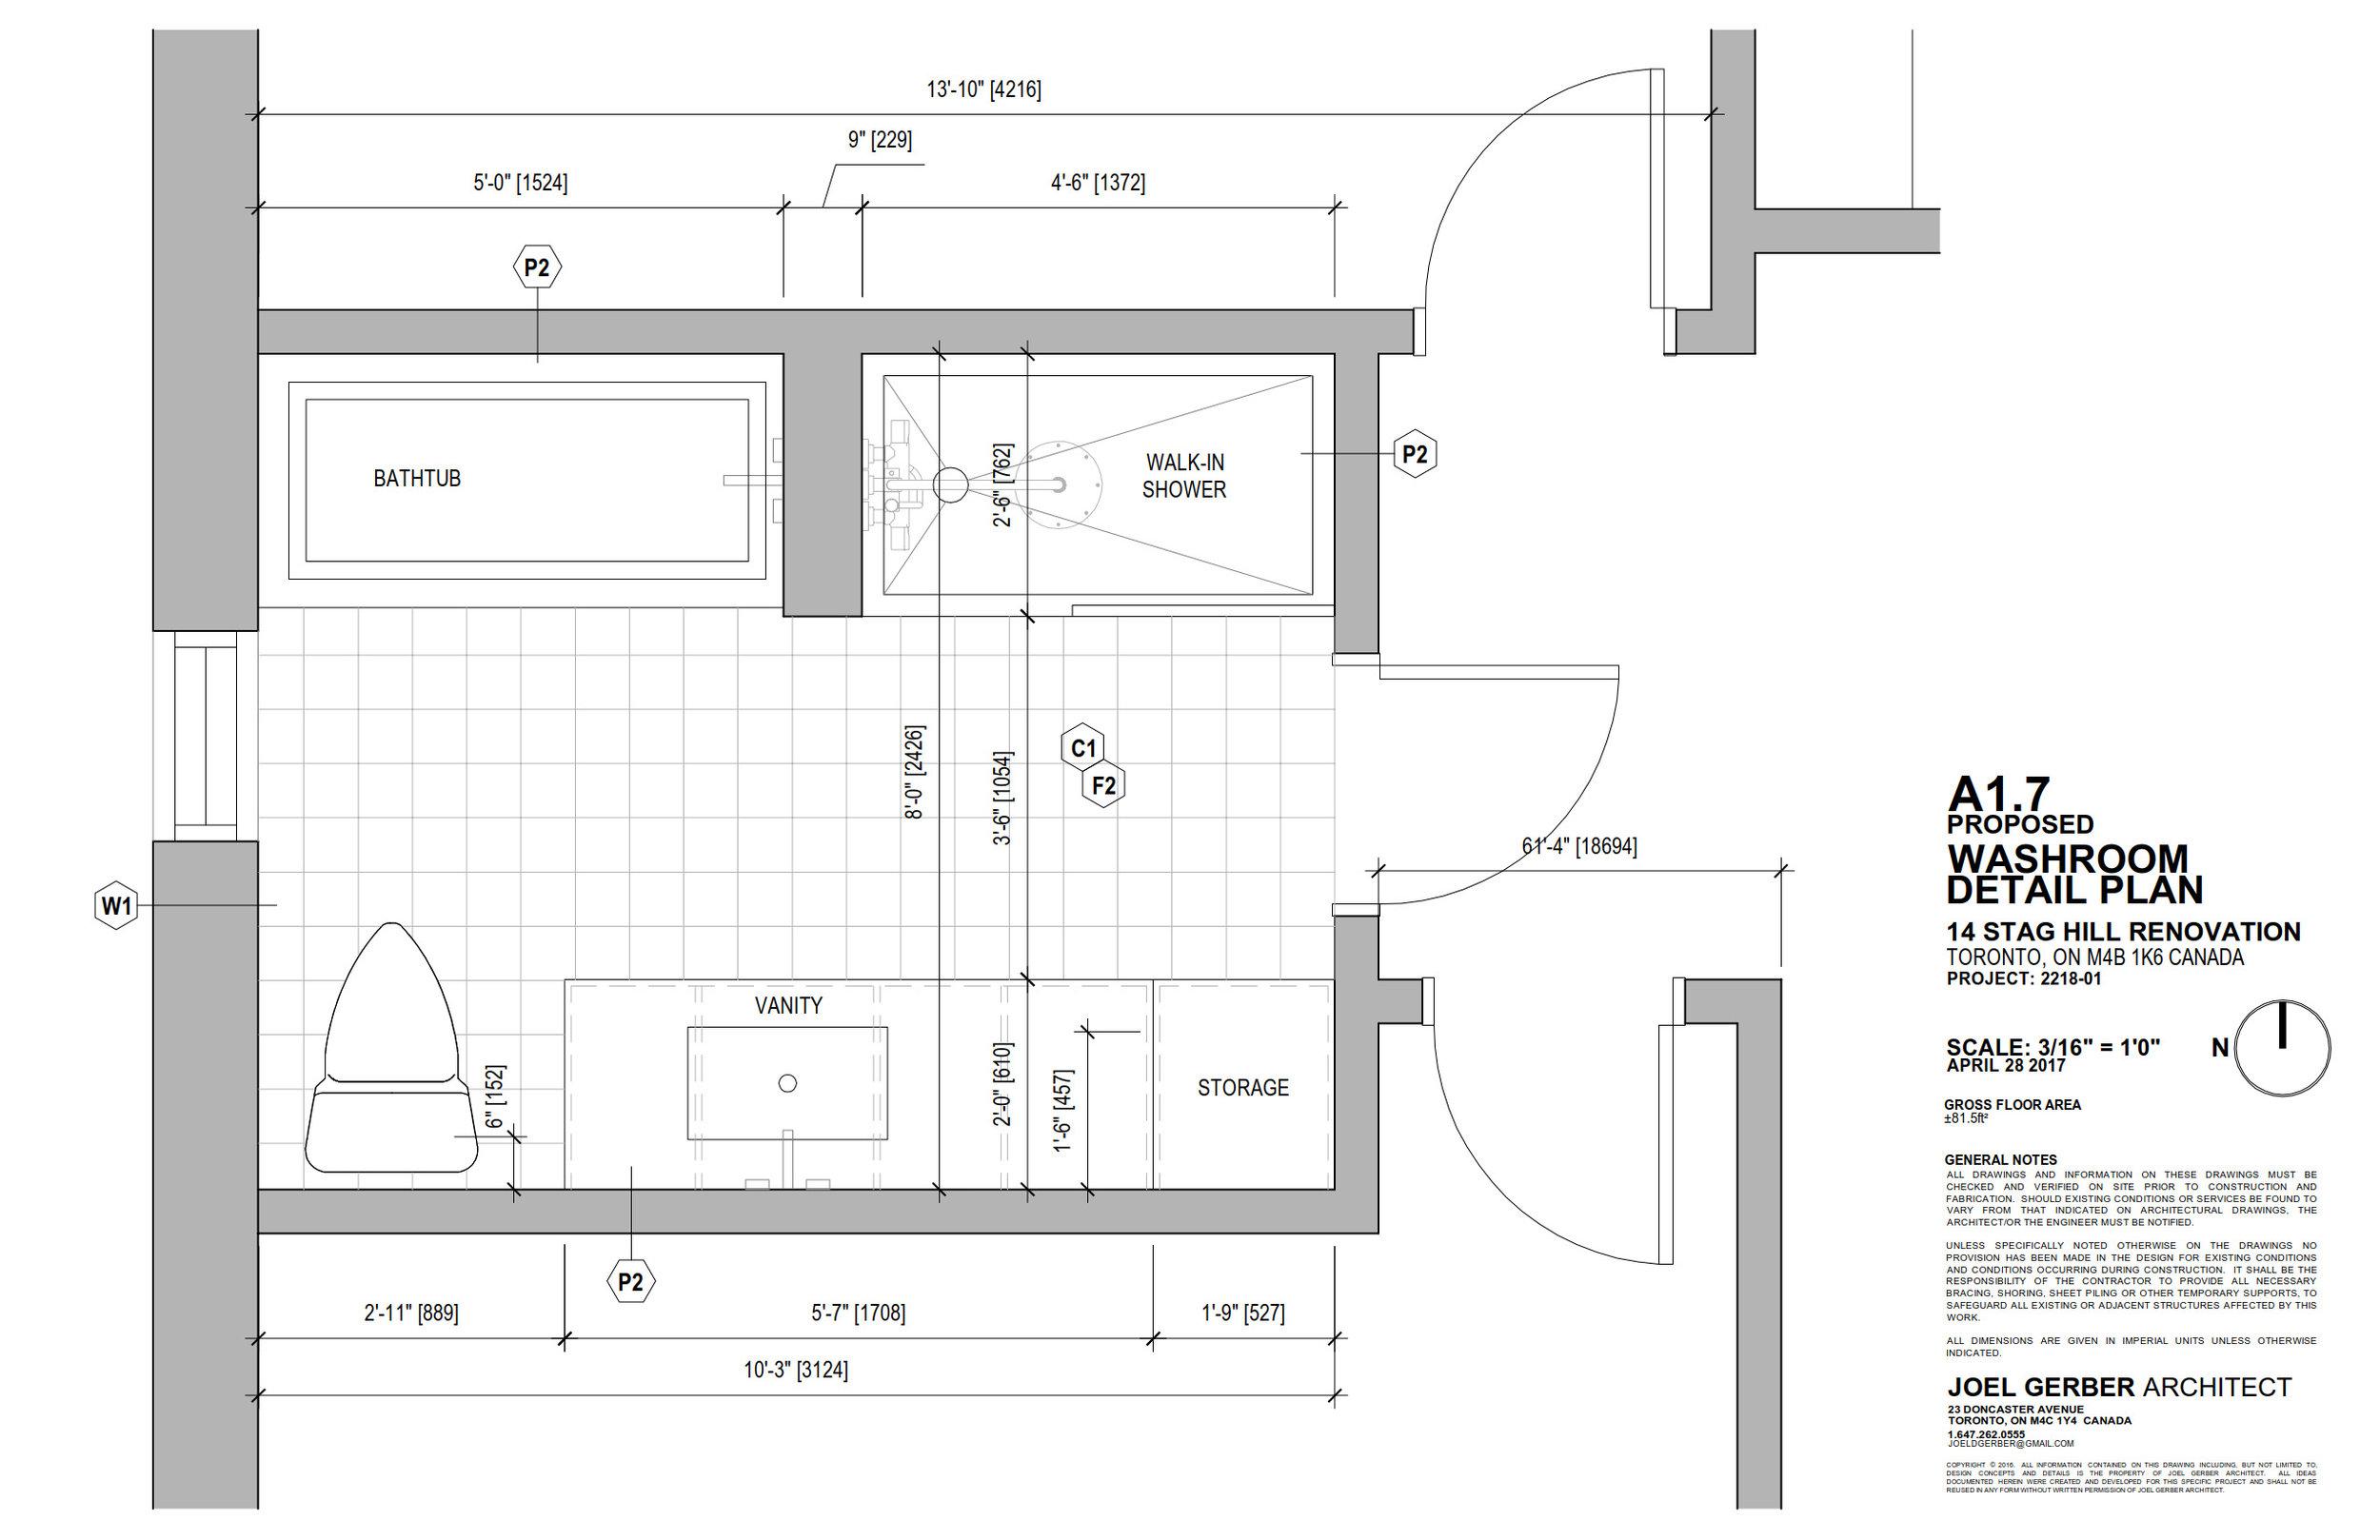 Drawing, Washroom Plan